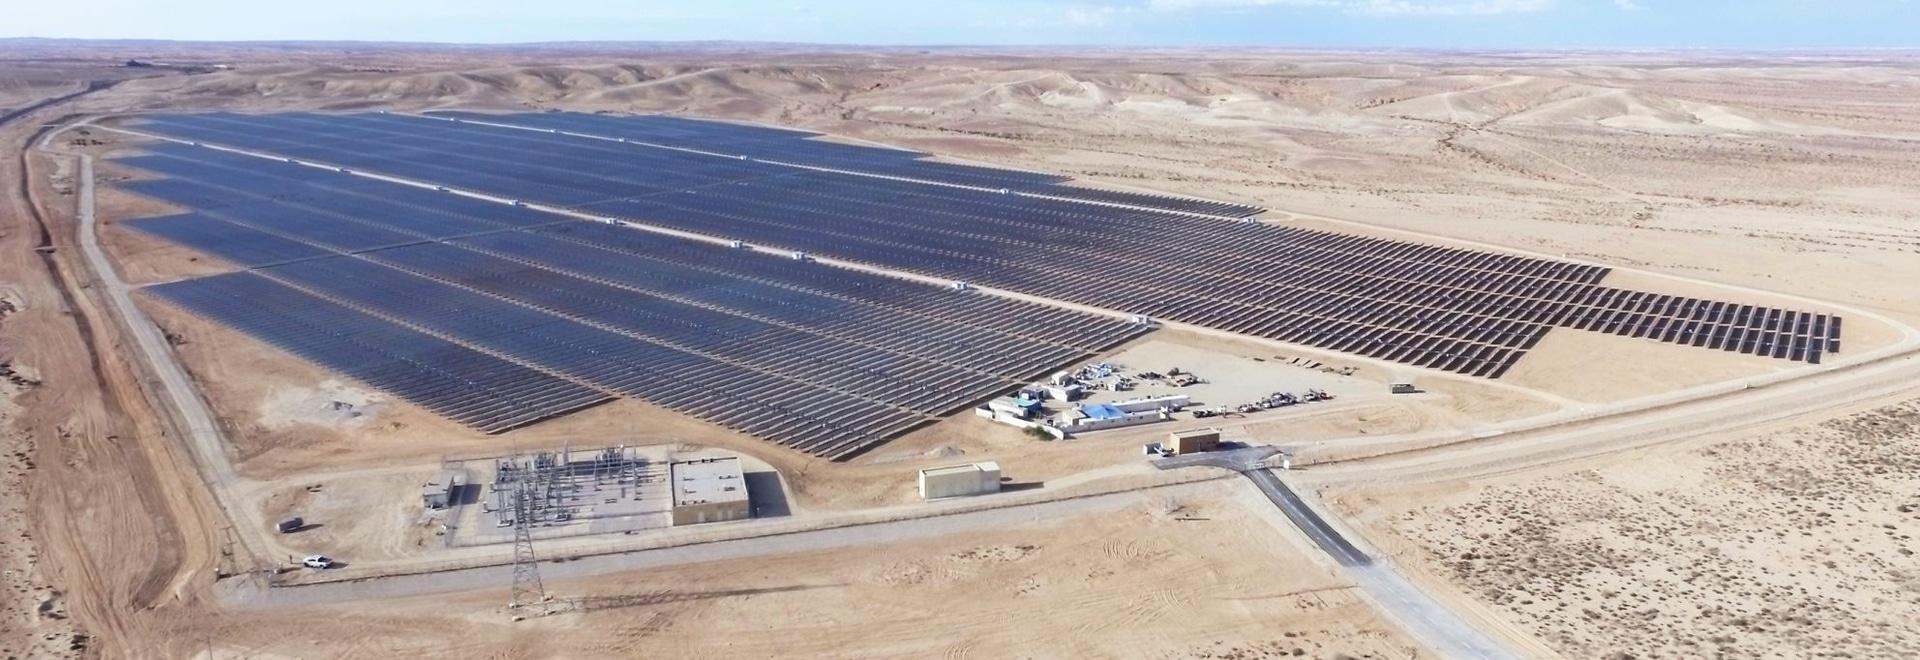 "Planta ""Ashalim ""de 30 MW picovoltio en Israel, construido por Belectric"